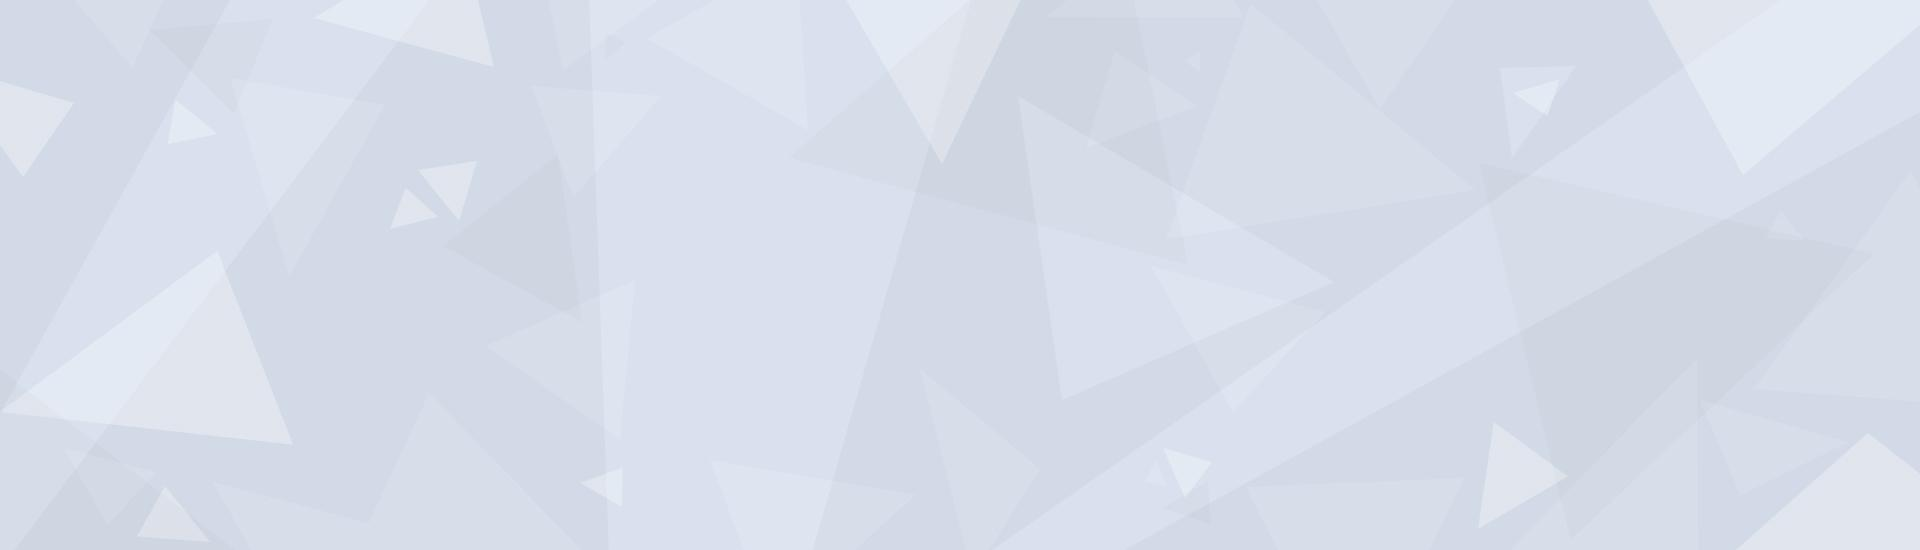 TKT Letho - VSLeague Online eSport